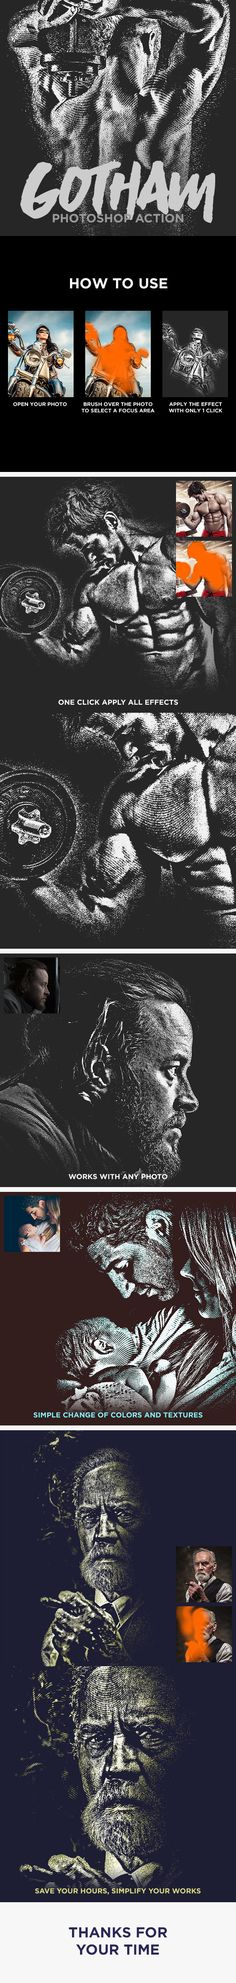 Gotham - Photo Effect Photoshop Action. Download here: http://graphicriver.net/item/gotham-photoshop-action/16203348?ref=ksioks